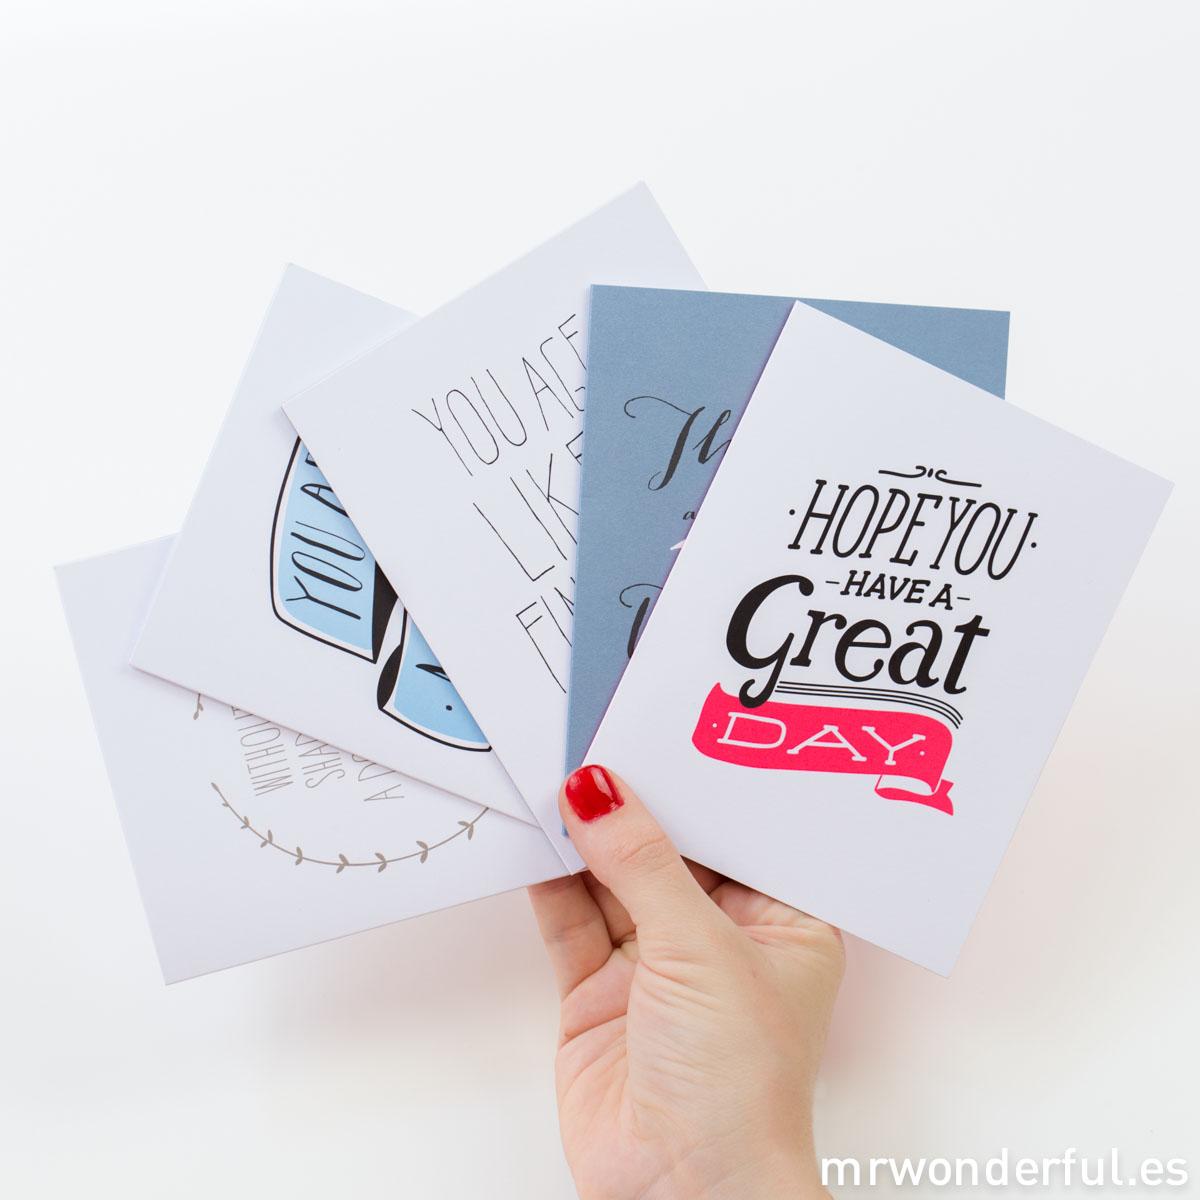 mrwonderful_felicitacion-06_tarjetas-felicitacion-color-5-modelos-ENG-62-Editar